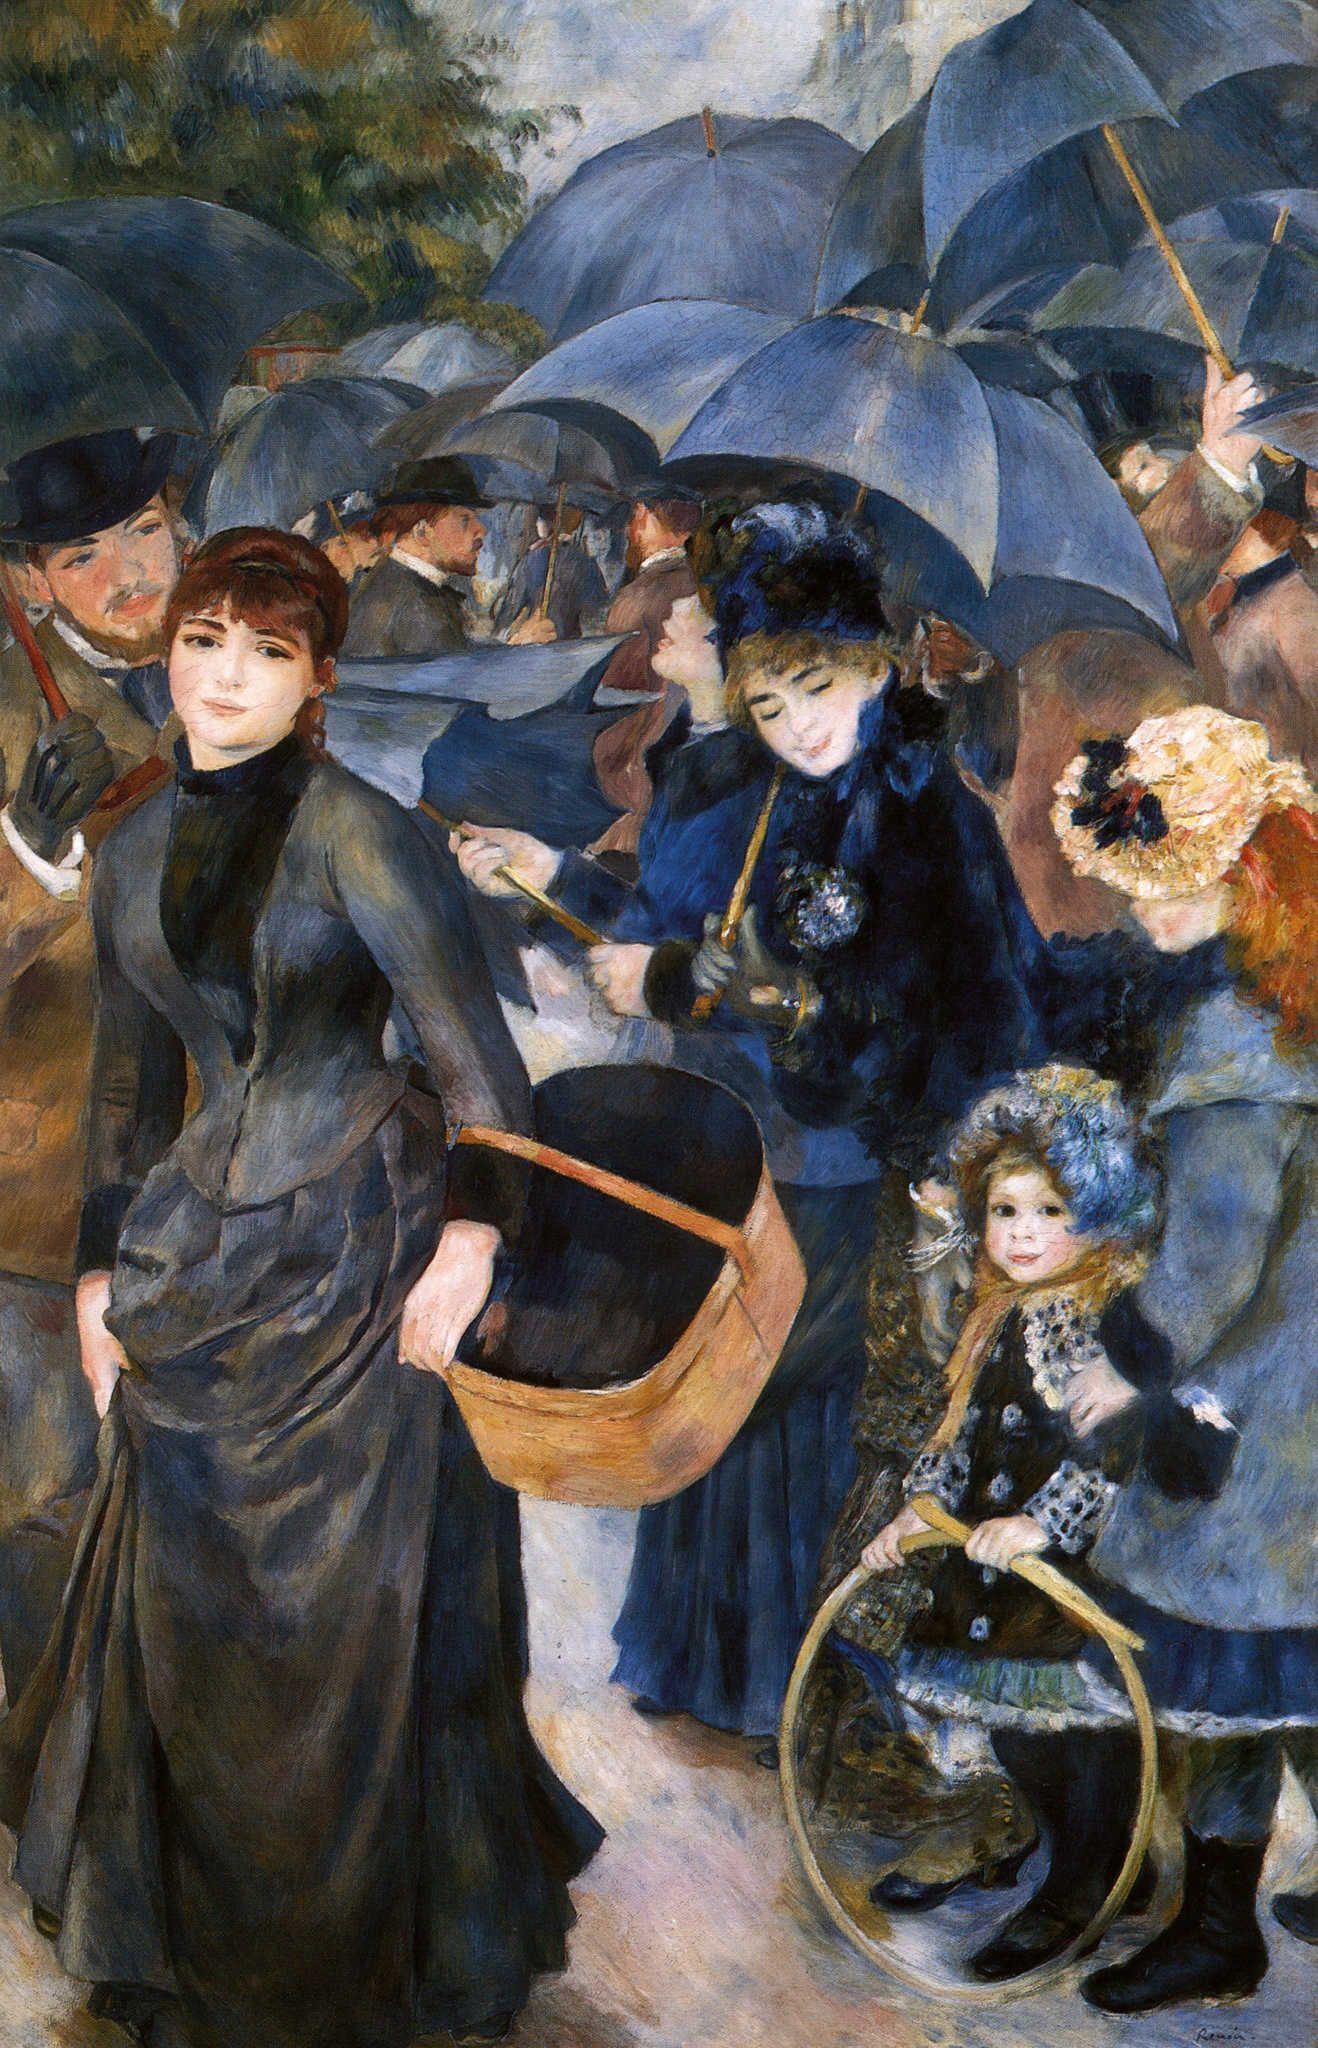 Renoir Umbrellas Painting